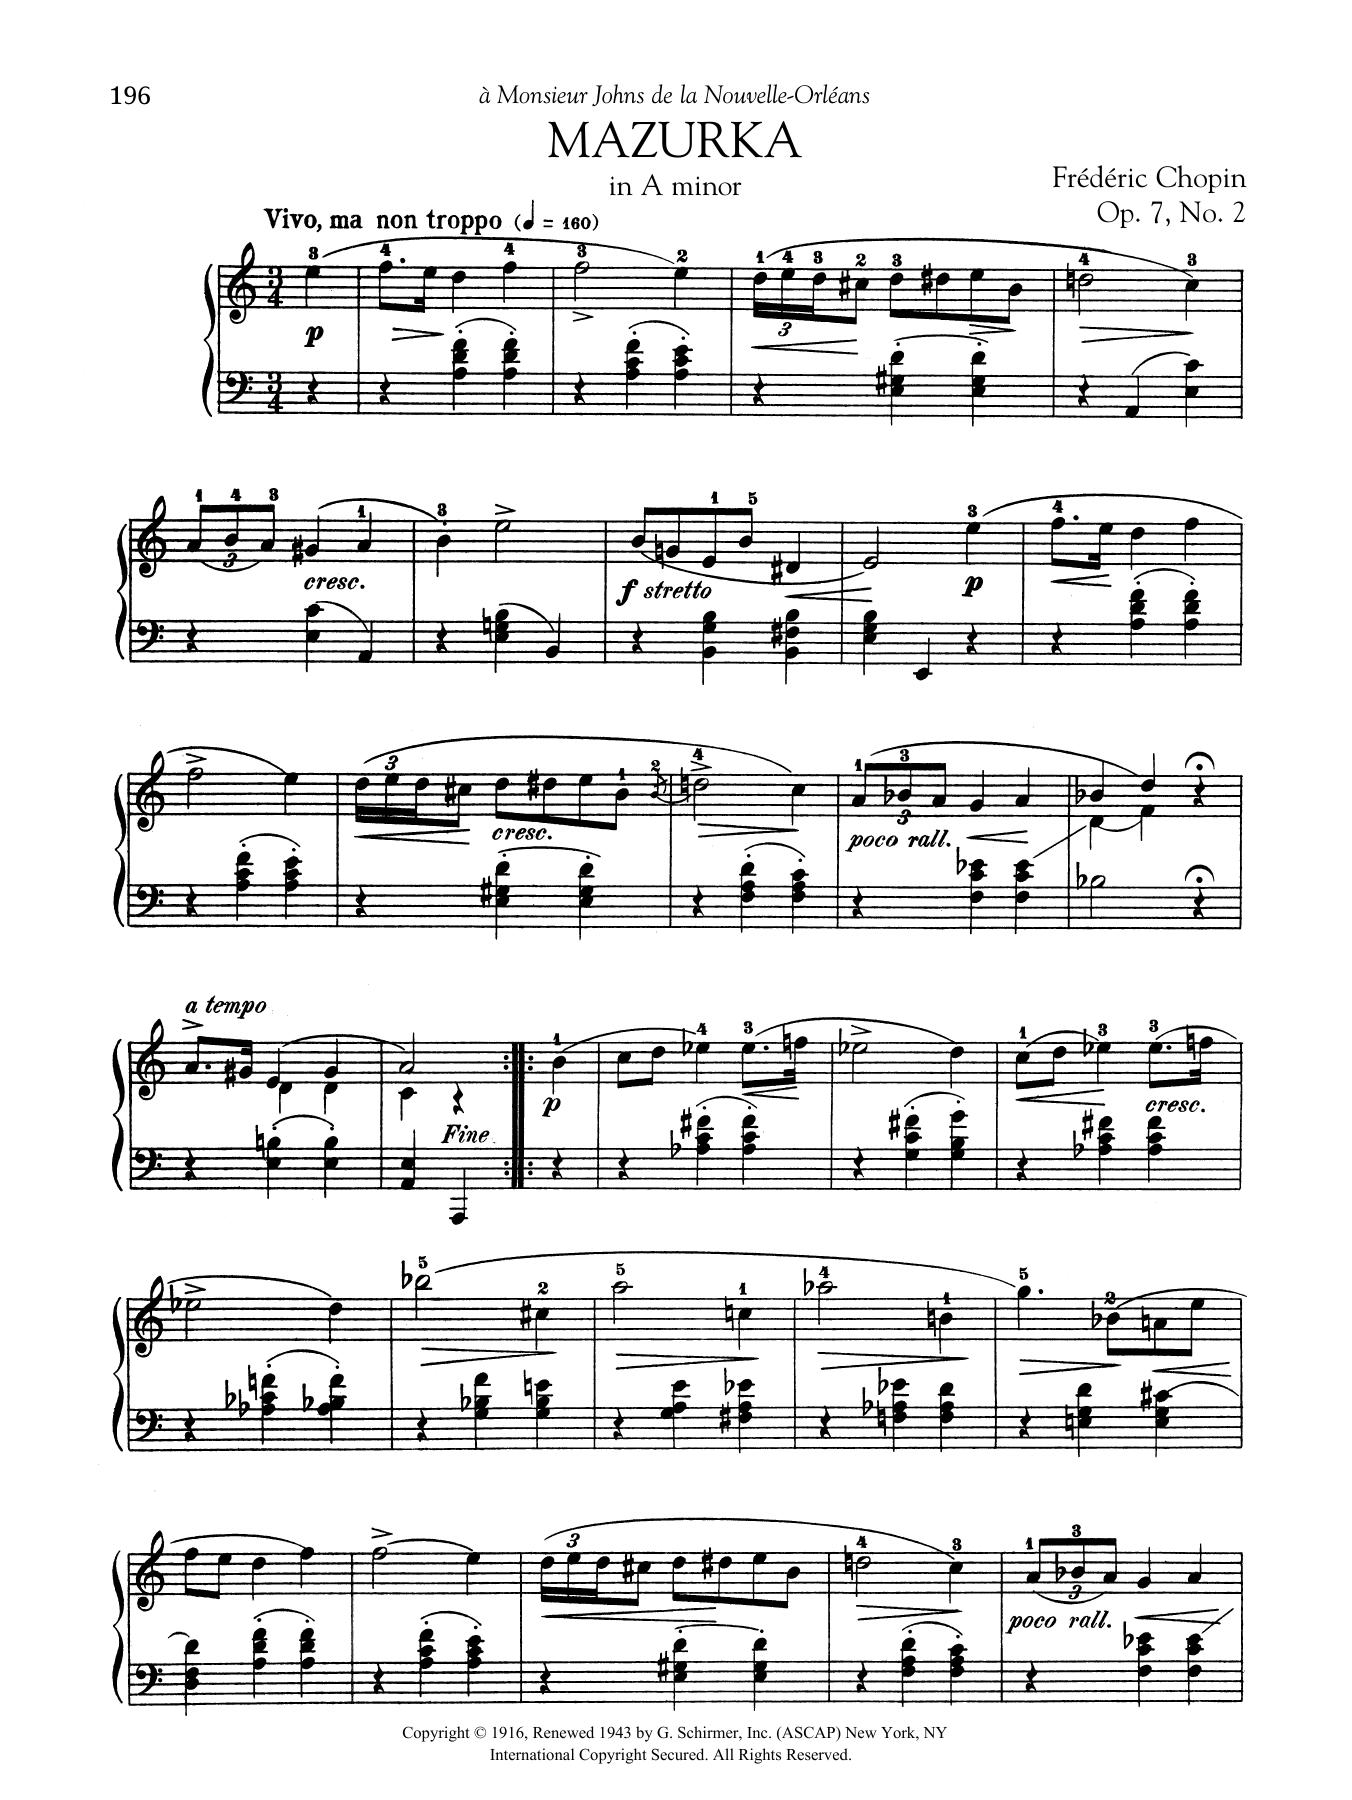 Mazurka in A minor, Op. 7, No. 2 Sheet Music